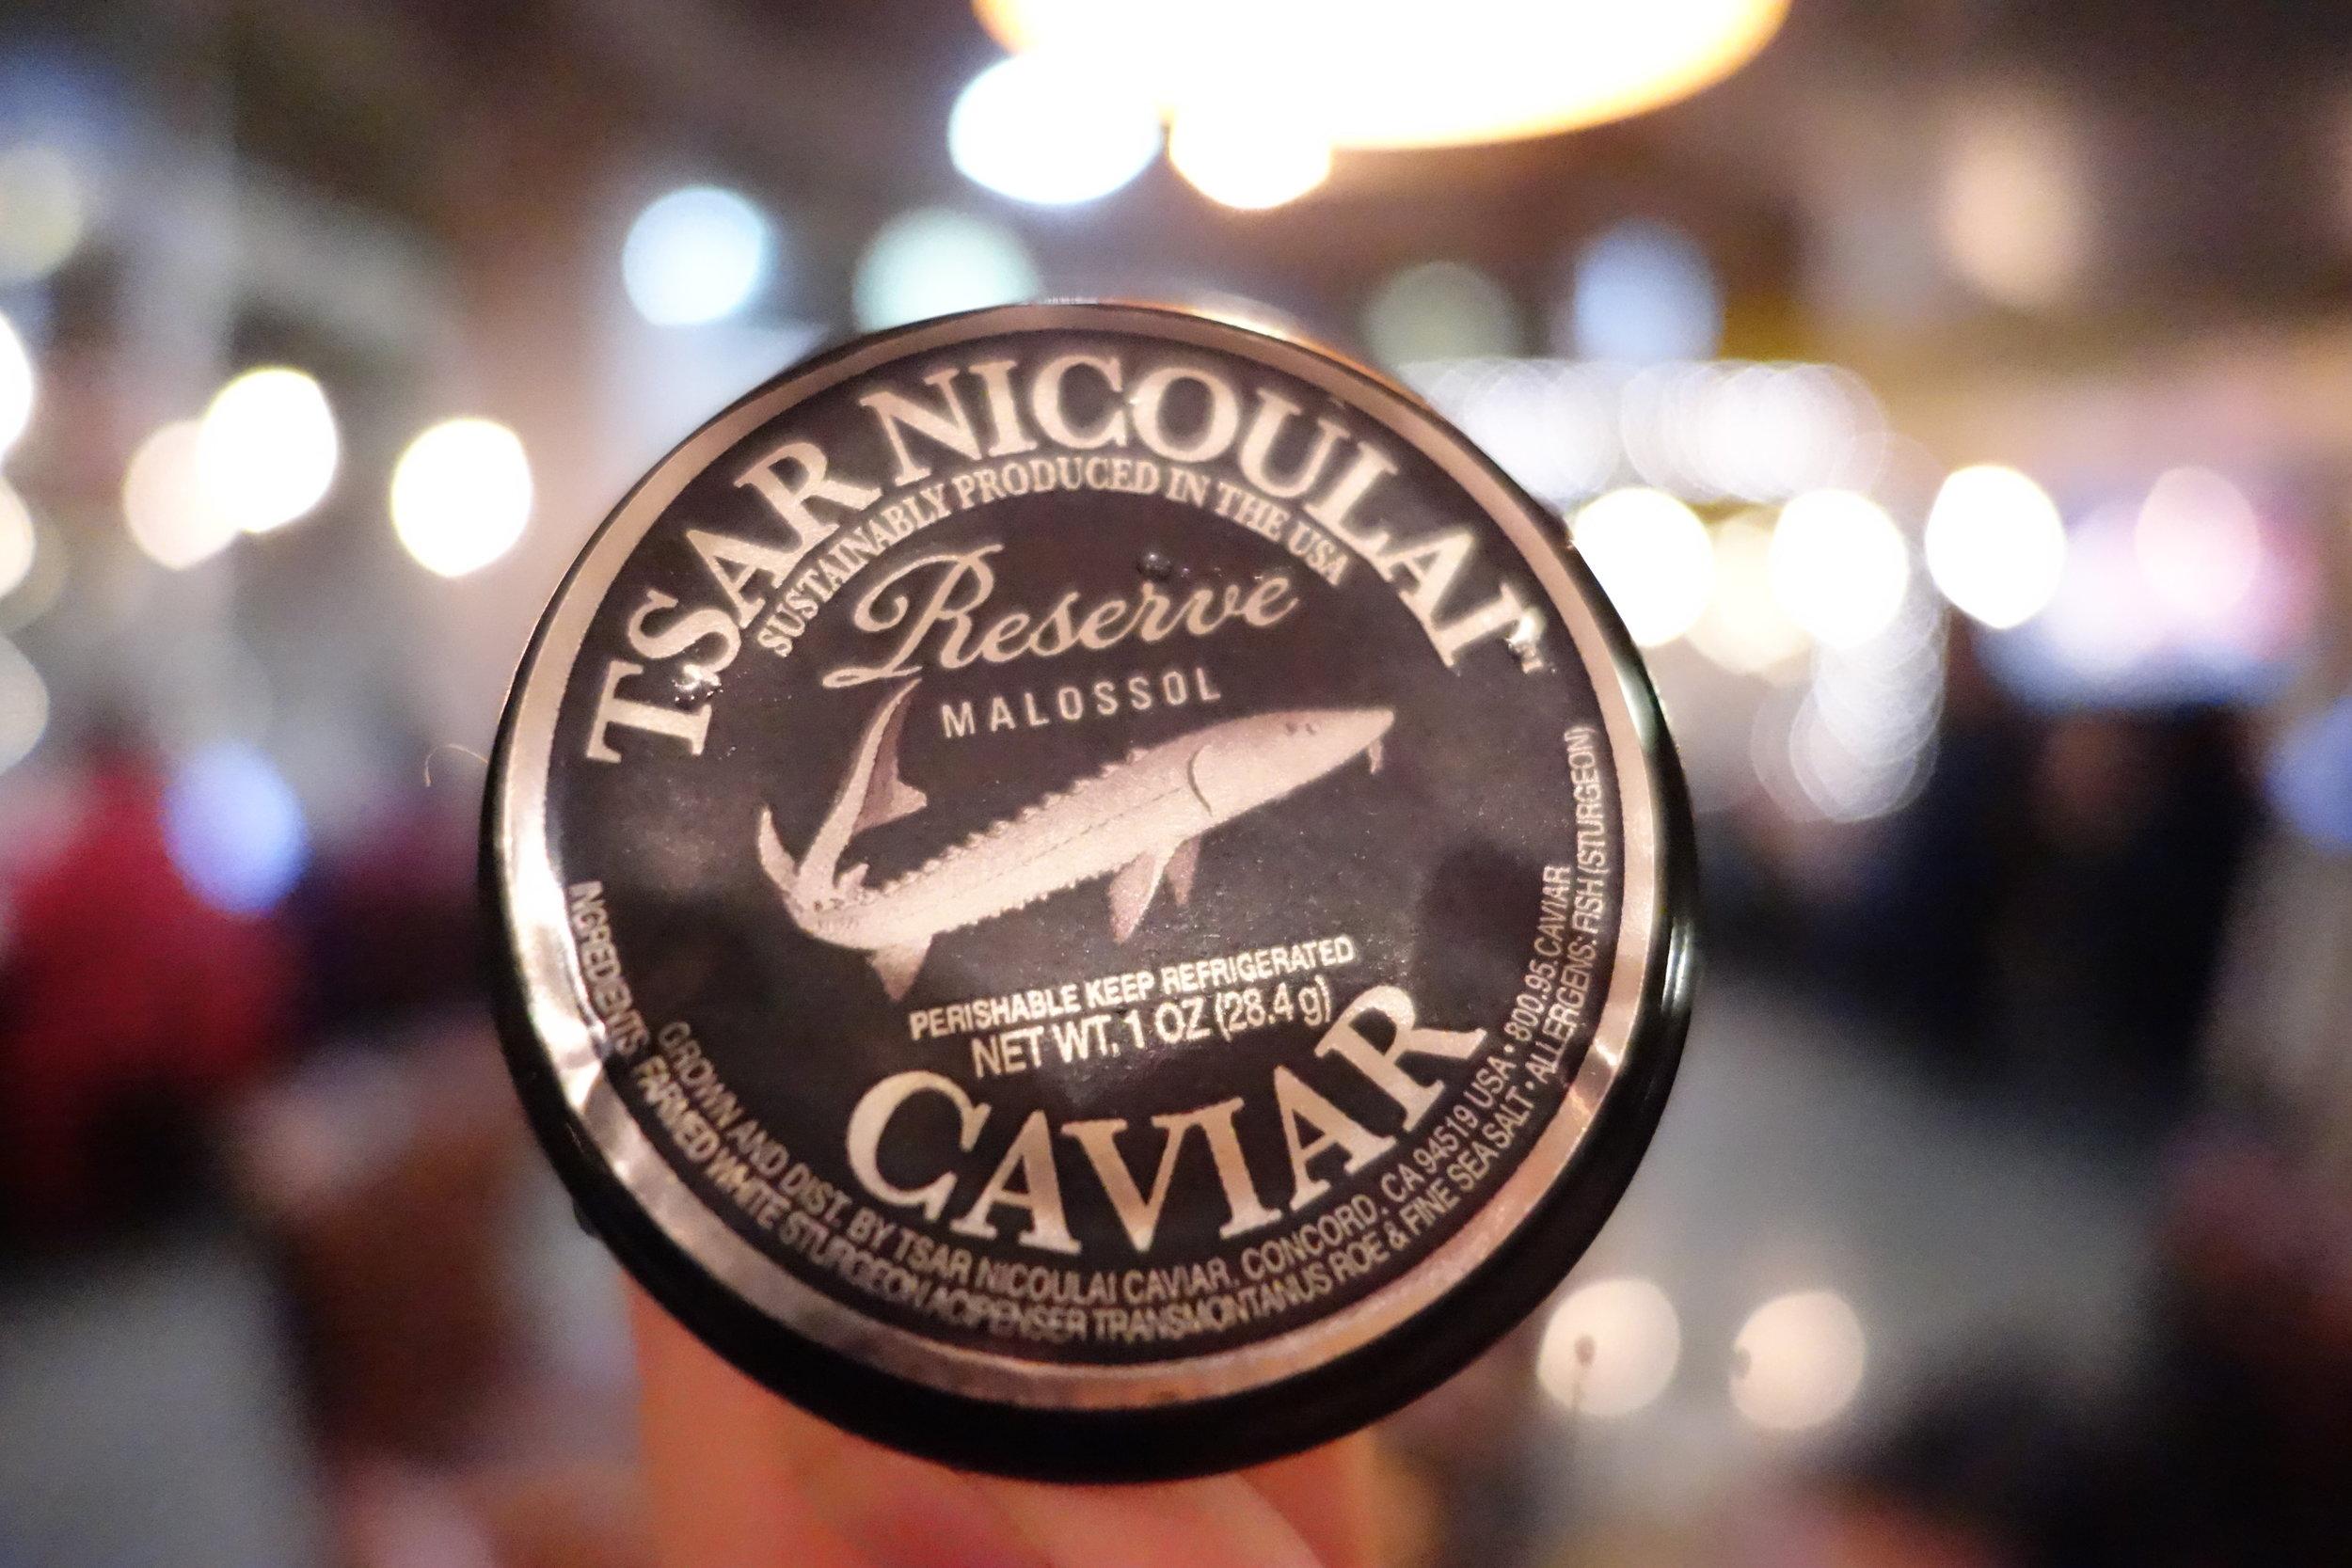 Tsar Nicoulai Reserve Caviar